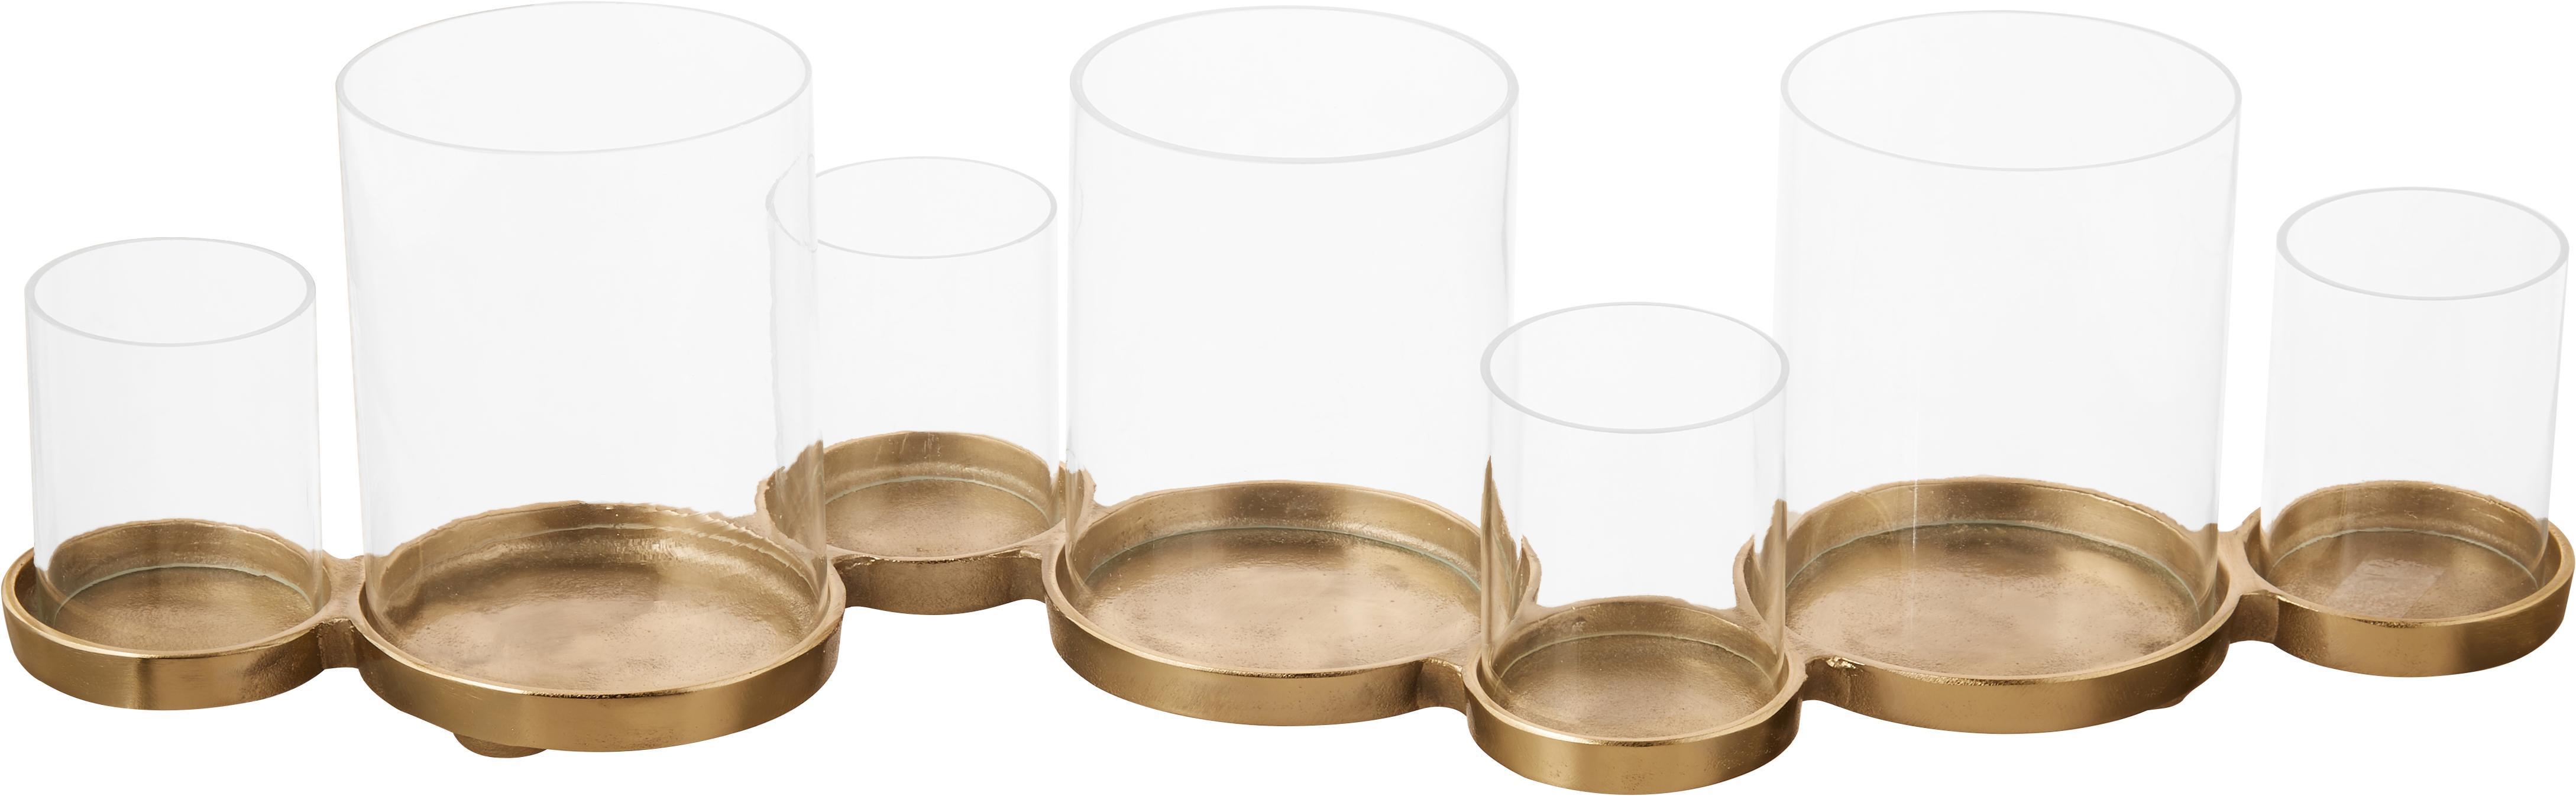 Portacandela Myra, Portacandela: vetro, Champagne, Larg. 58 x Alt. 14 cm